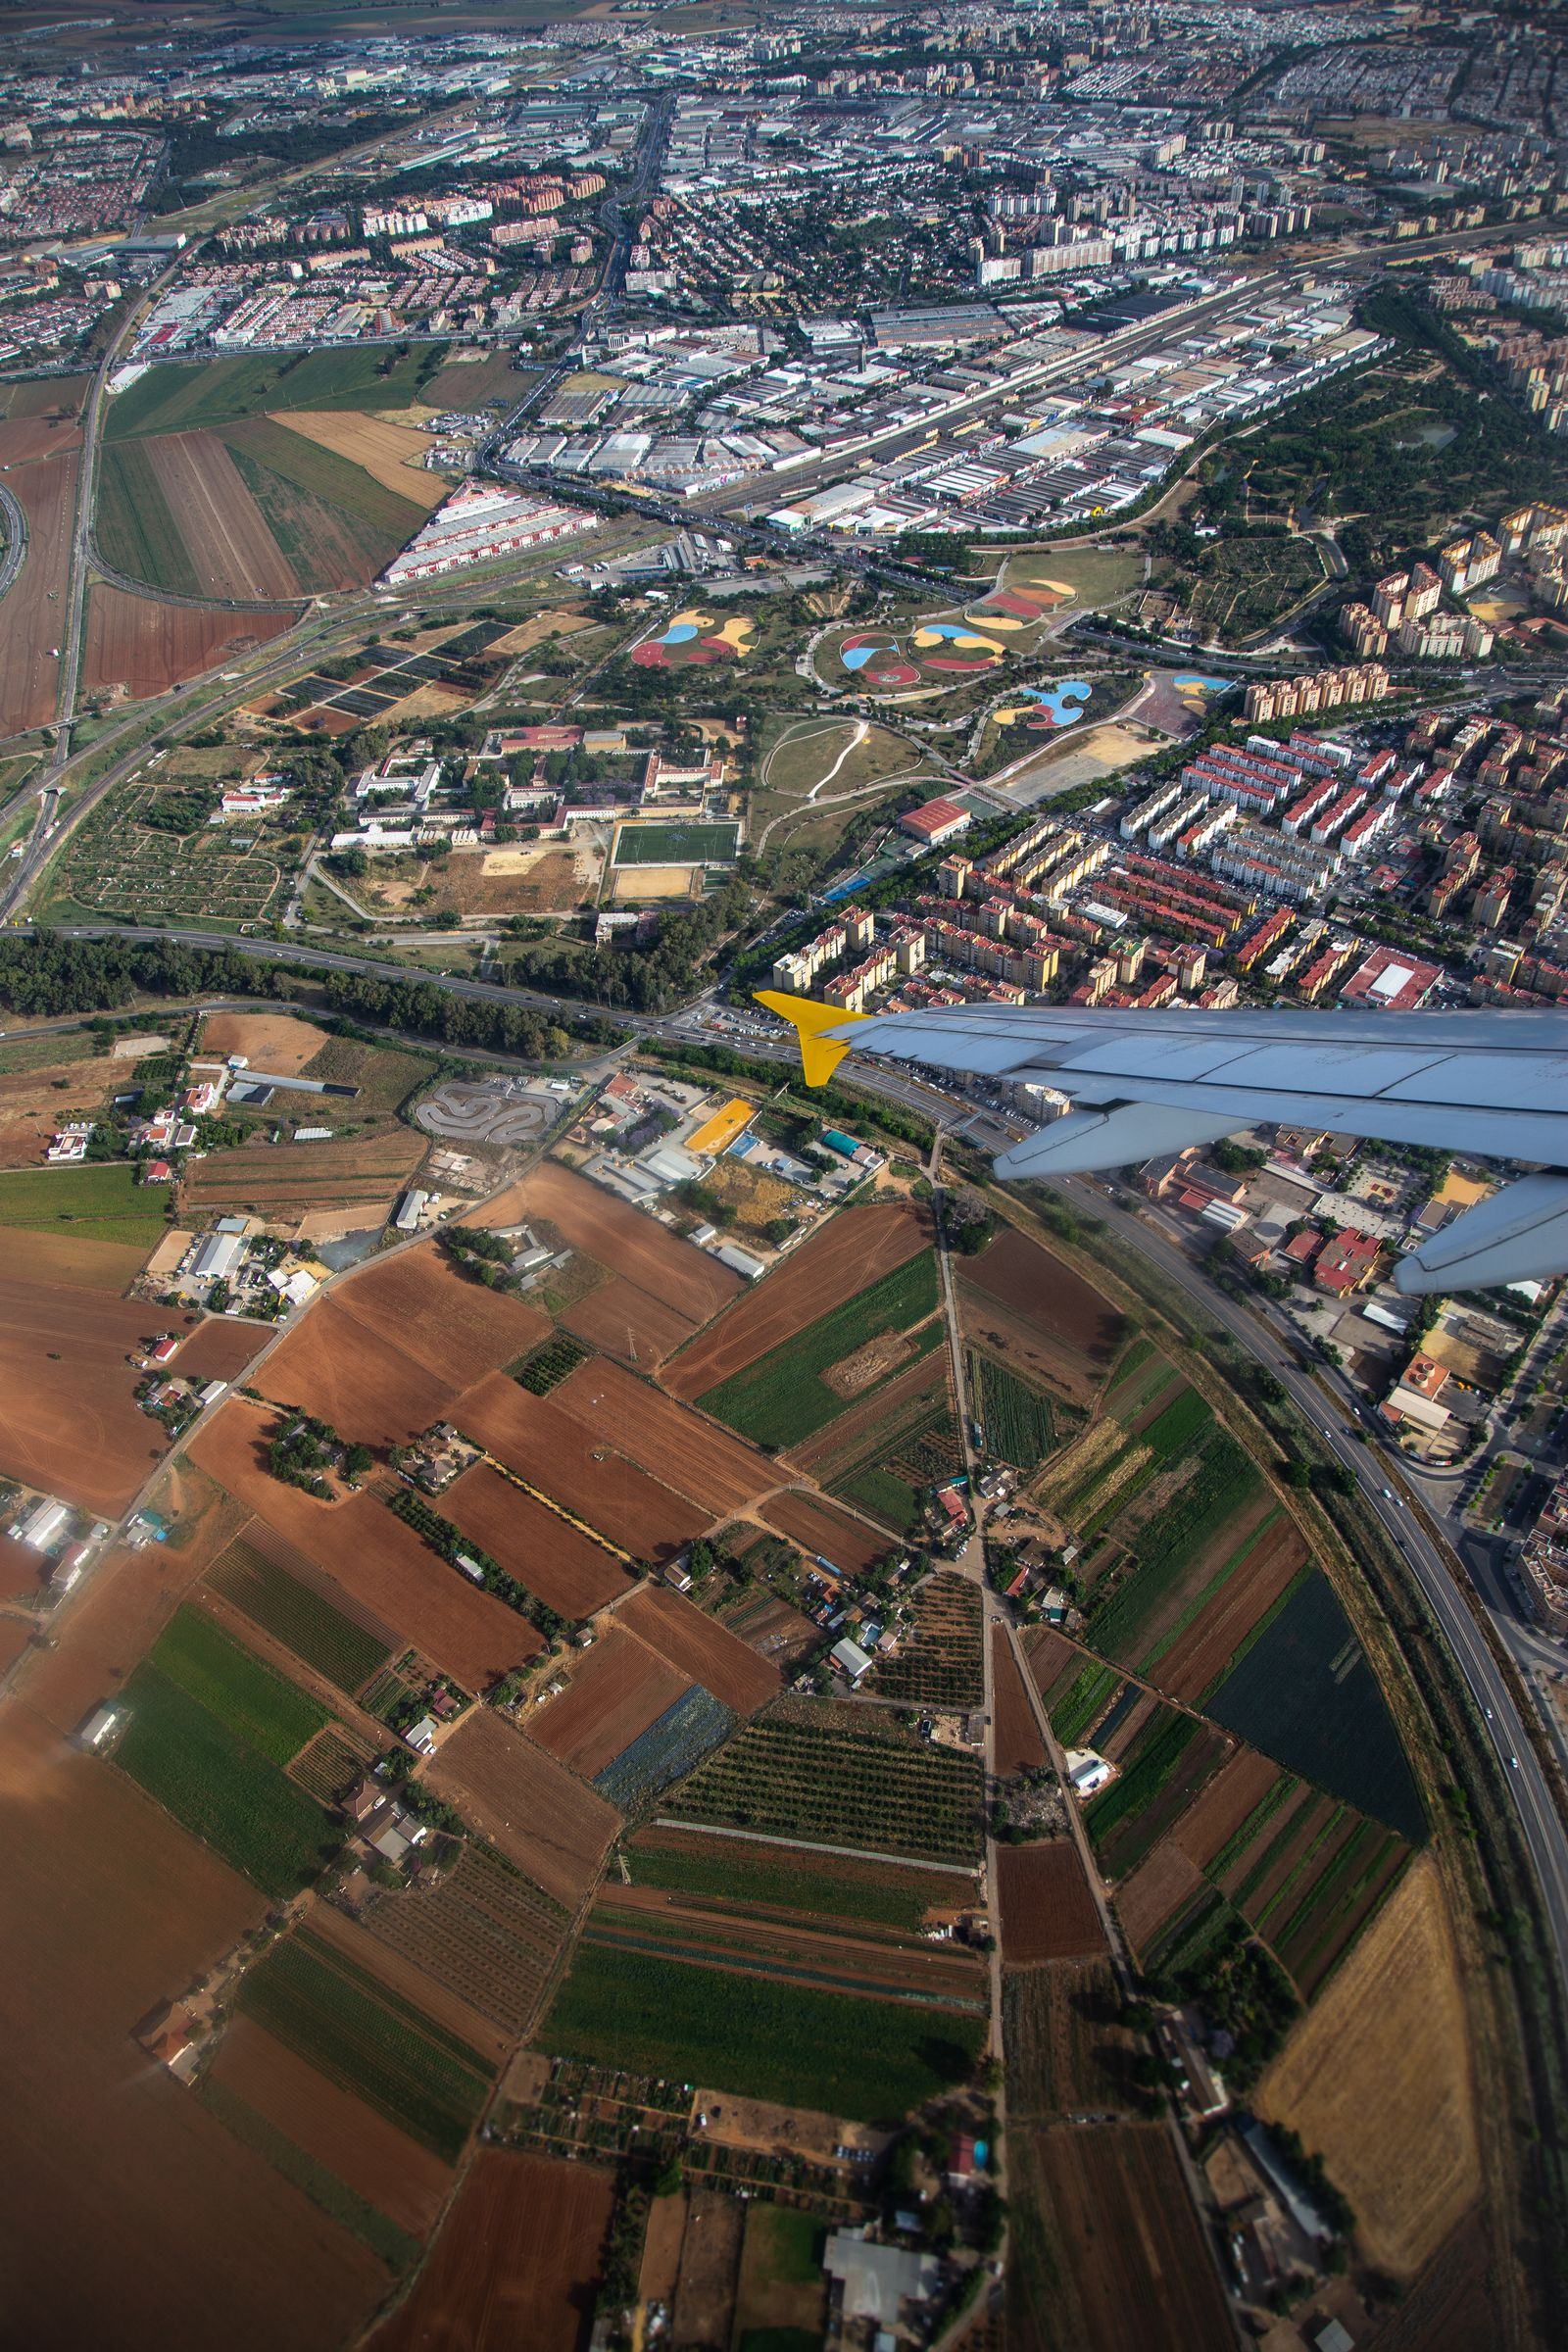 Adiós, Sevilla